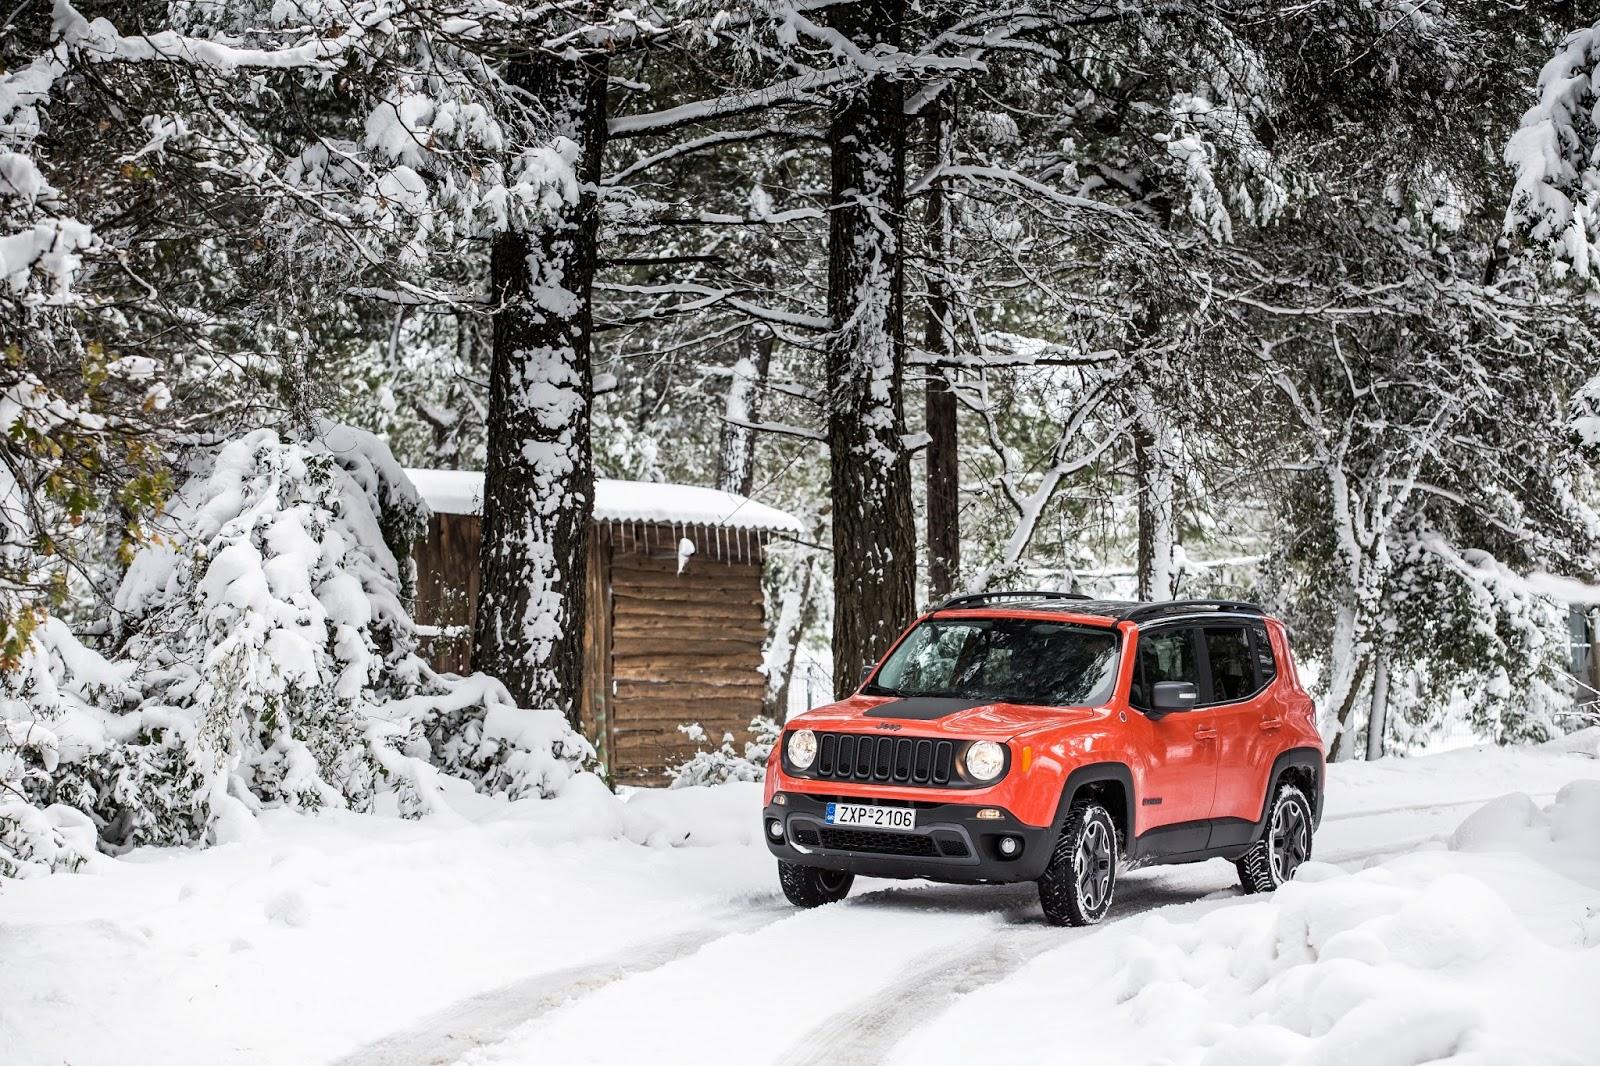 Jeep2BCamp2B25CF258325CF258425CE25B725CE25BD2B25CE259125CF258125CE25AC25CF258725CF258925CE25B225CE25B12Blow Η Jeep επιστρέφει στην Αράχωβα για παιχνίδια με το χιόνι! Jeep, jeep camp, Jeep Renegade, Jeep Renegade Trailhawk, Offroad